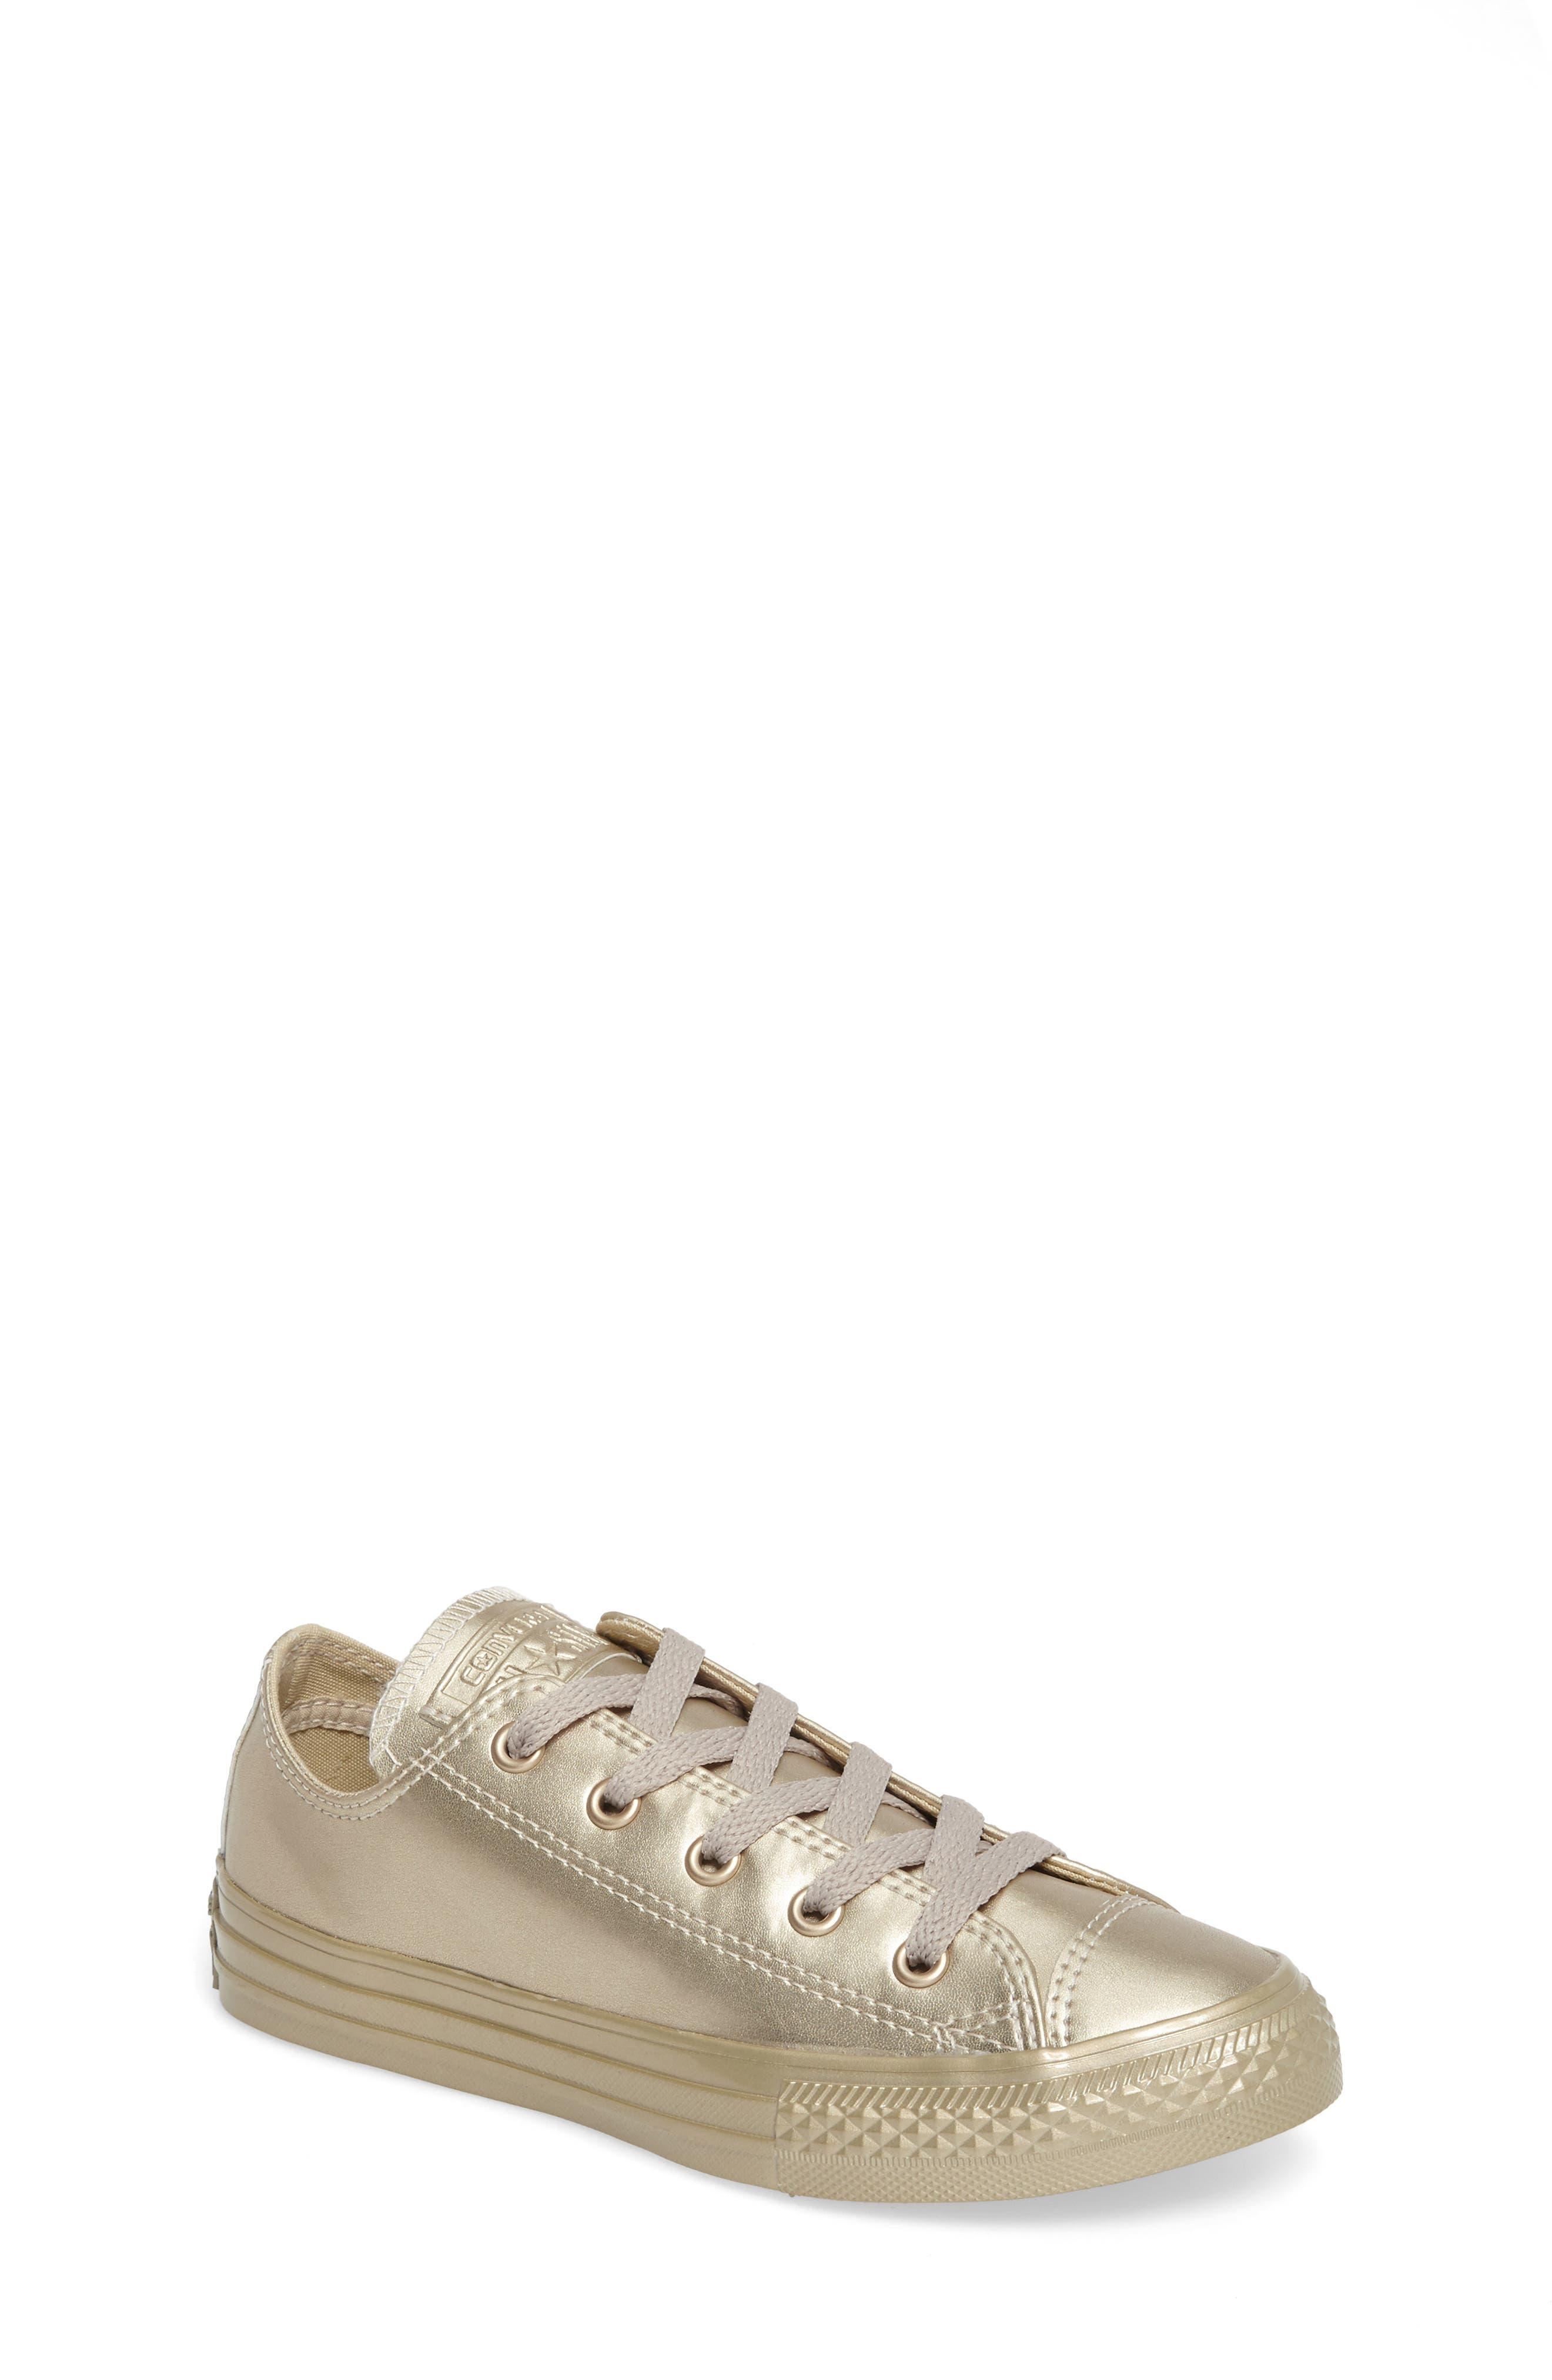 Chuck Taylor<sup>®</sup> All Star<sup>®</sup> Mono Metallic Low Top Sneaker,                             Main thumbnail 1, color,                             710